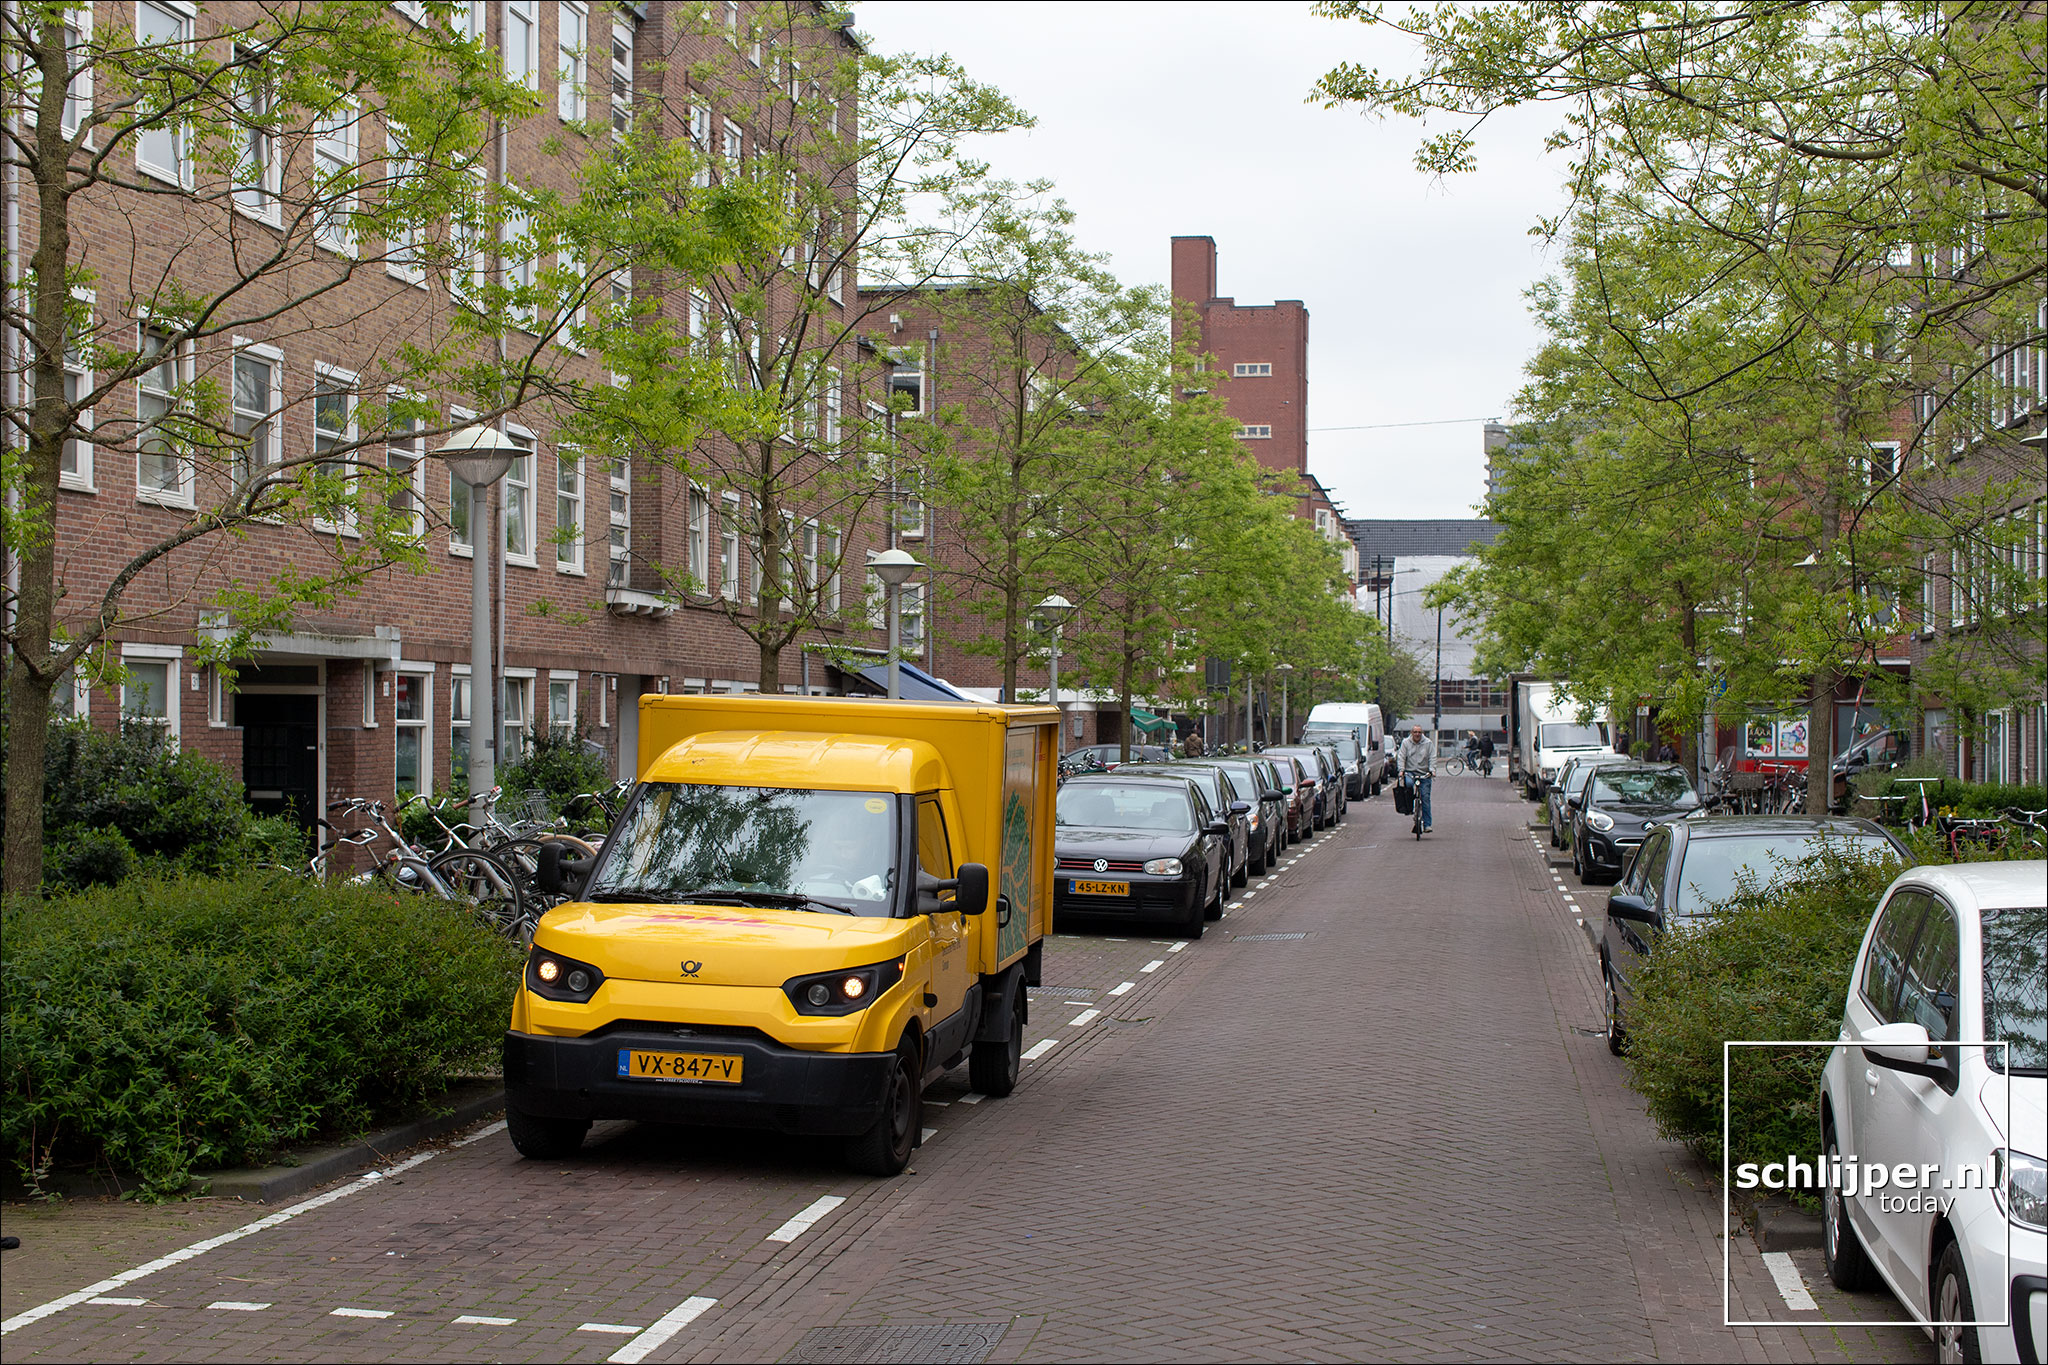 Nederland, Amsterdam, 1 mei 2019